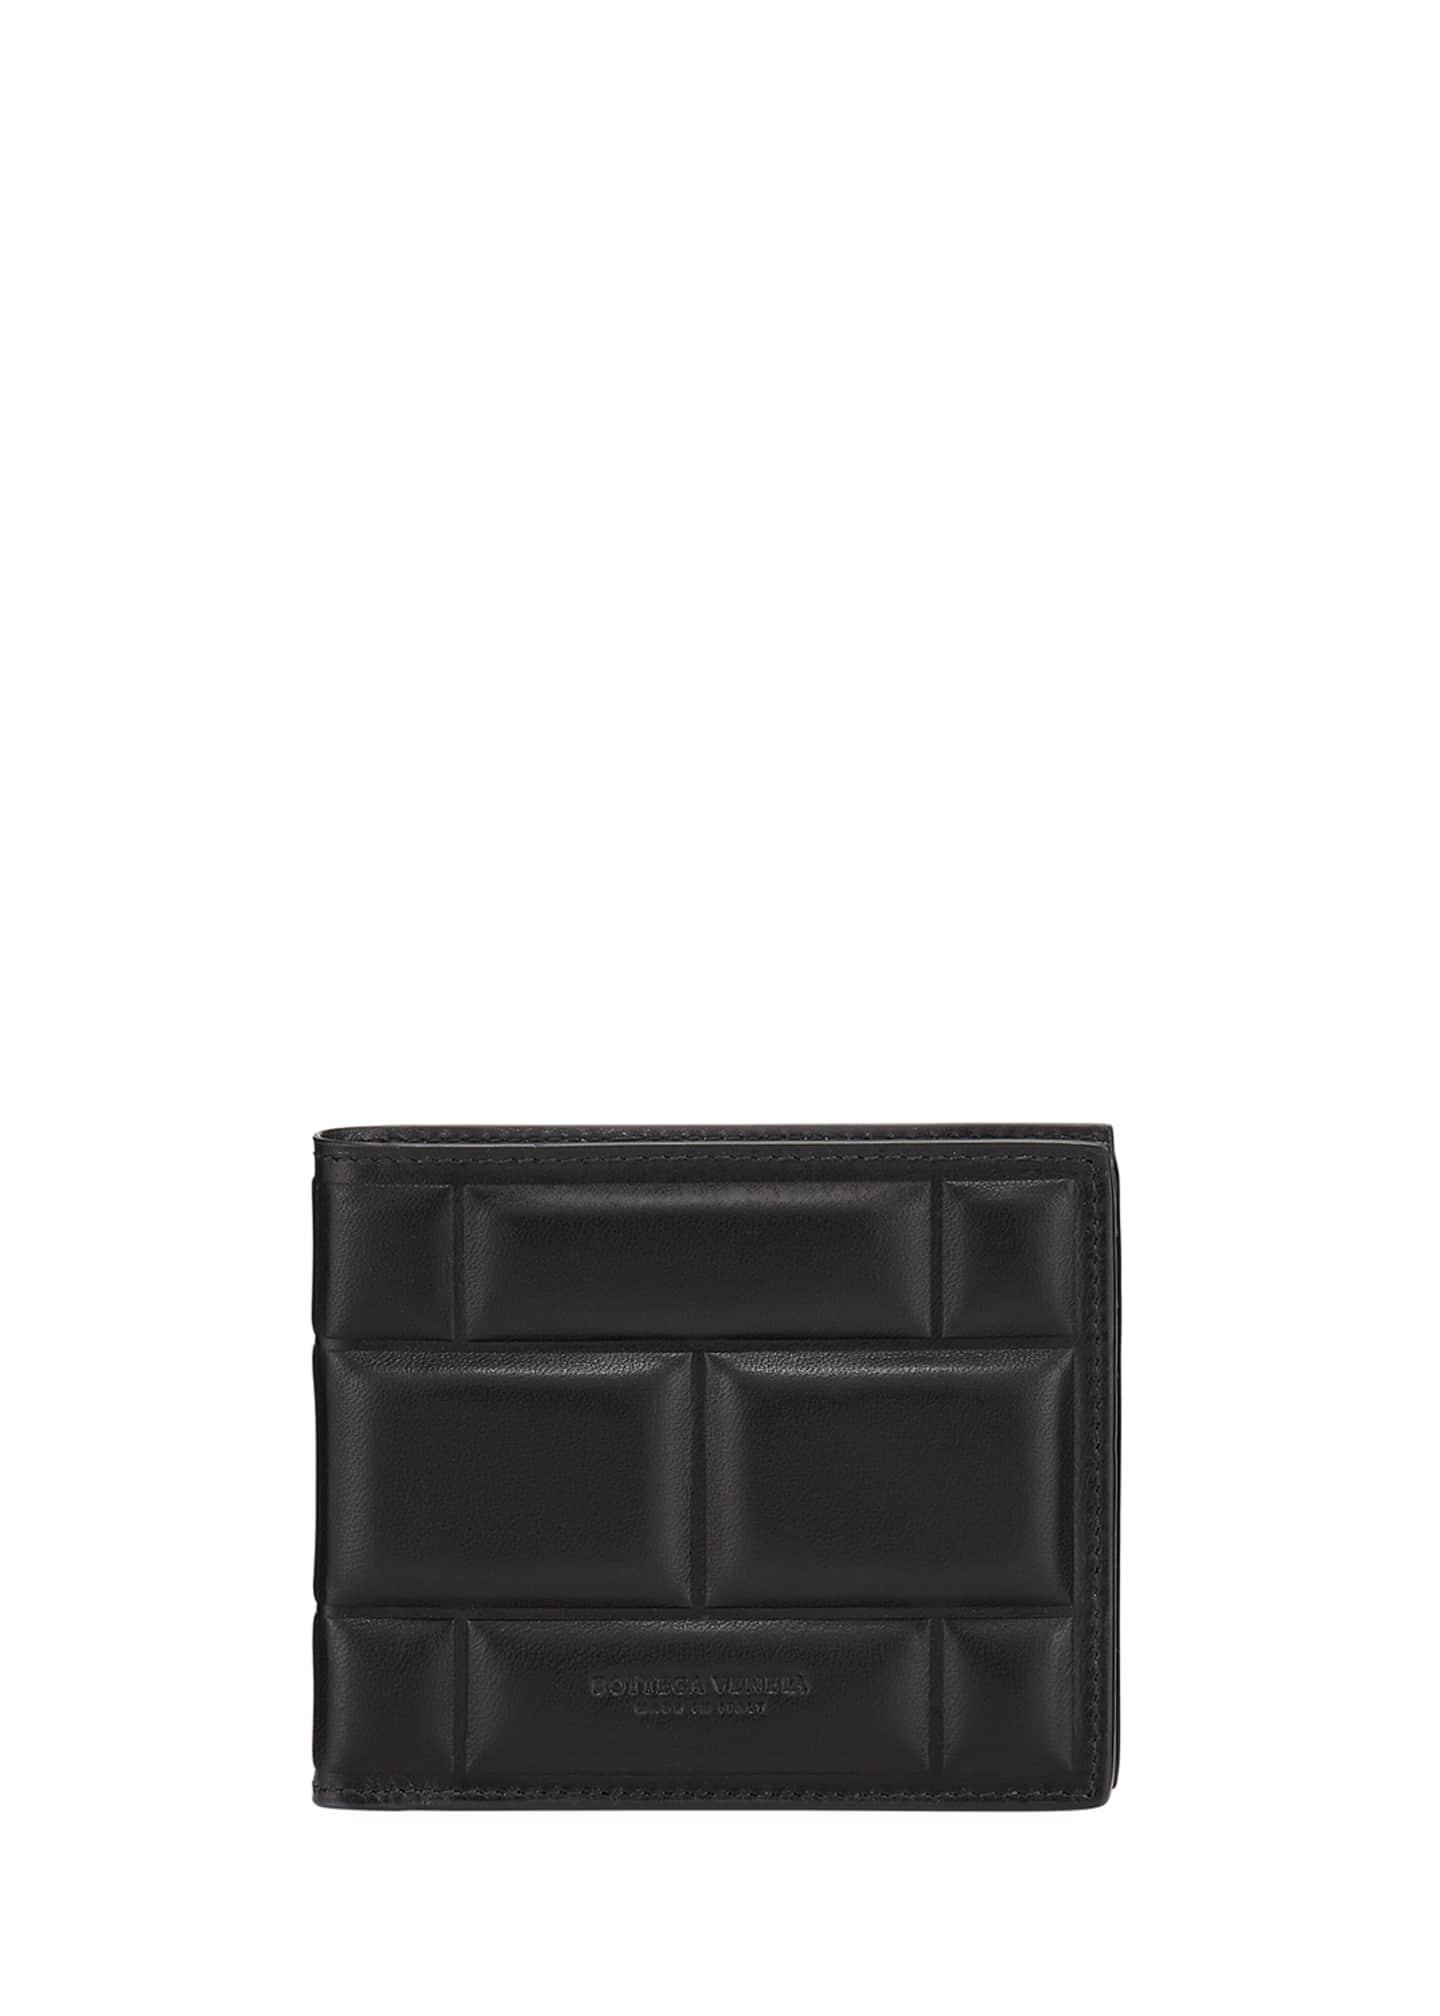 Bottega Veneta Men's Textured Leather Bifold Wallet